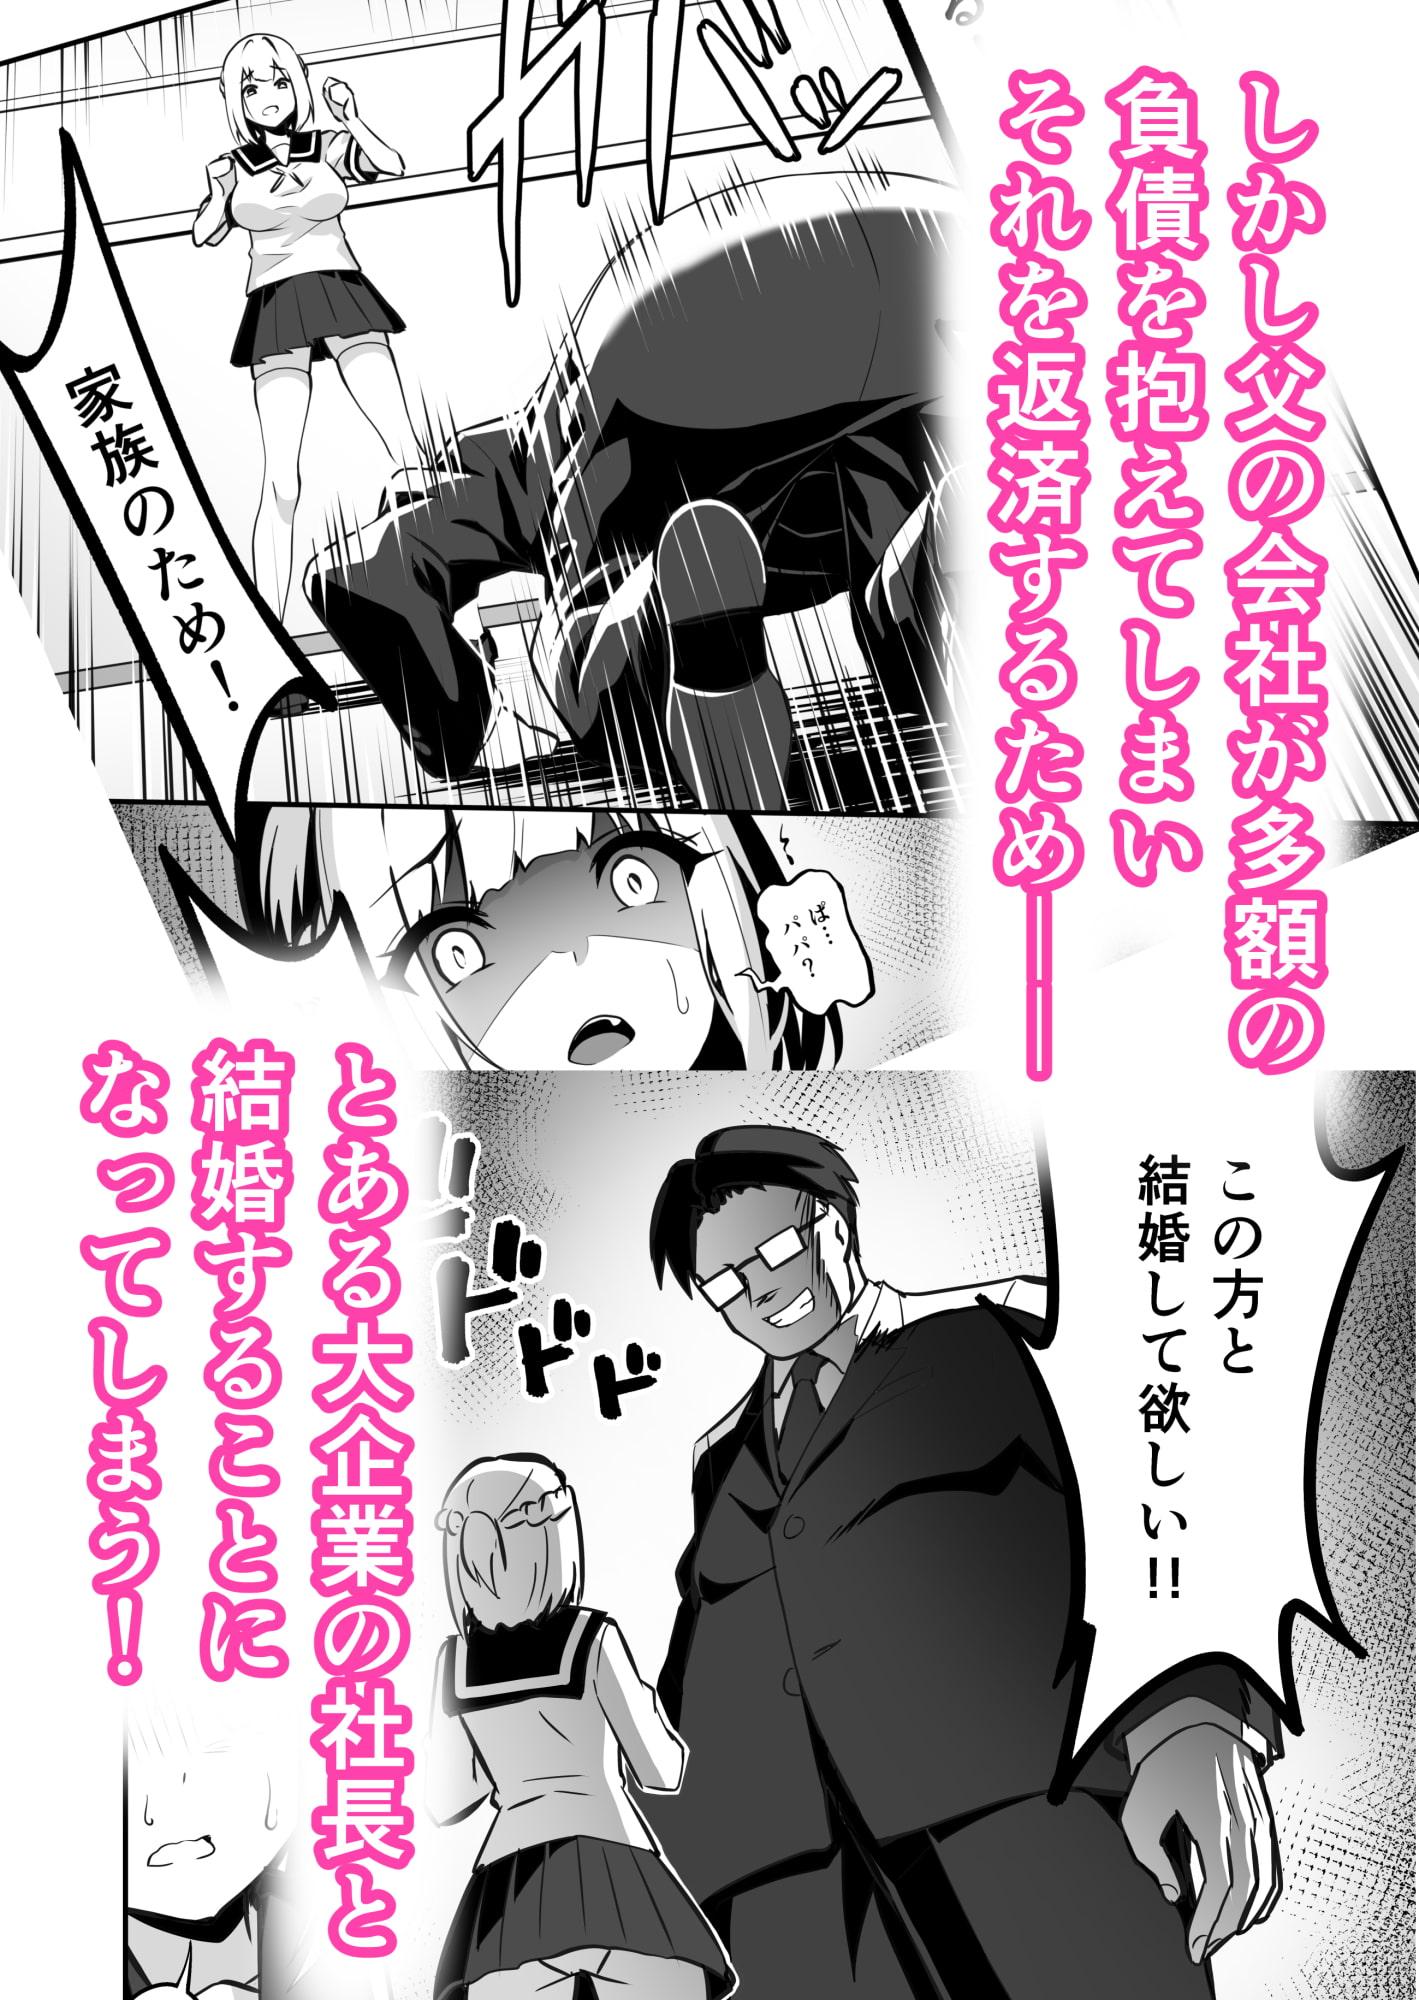 RJ320479 イキナリ婚-令嬢女子〇生・由夢がちる- [20210312]